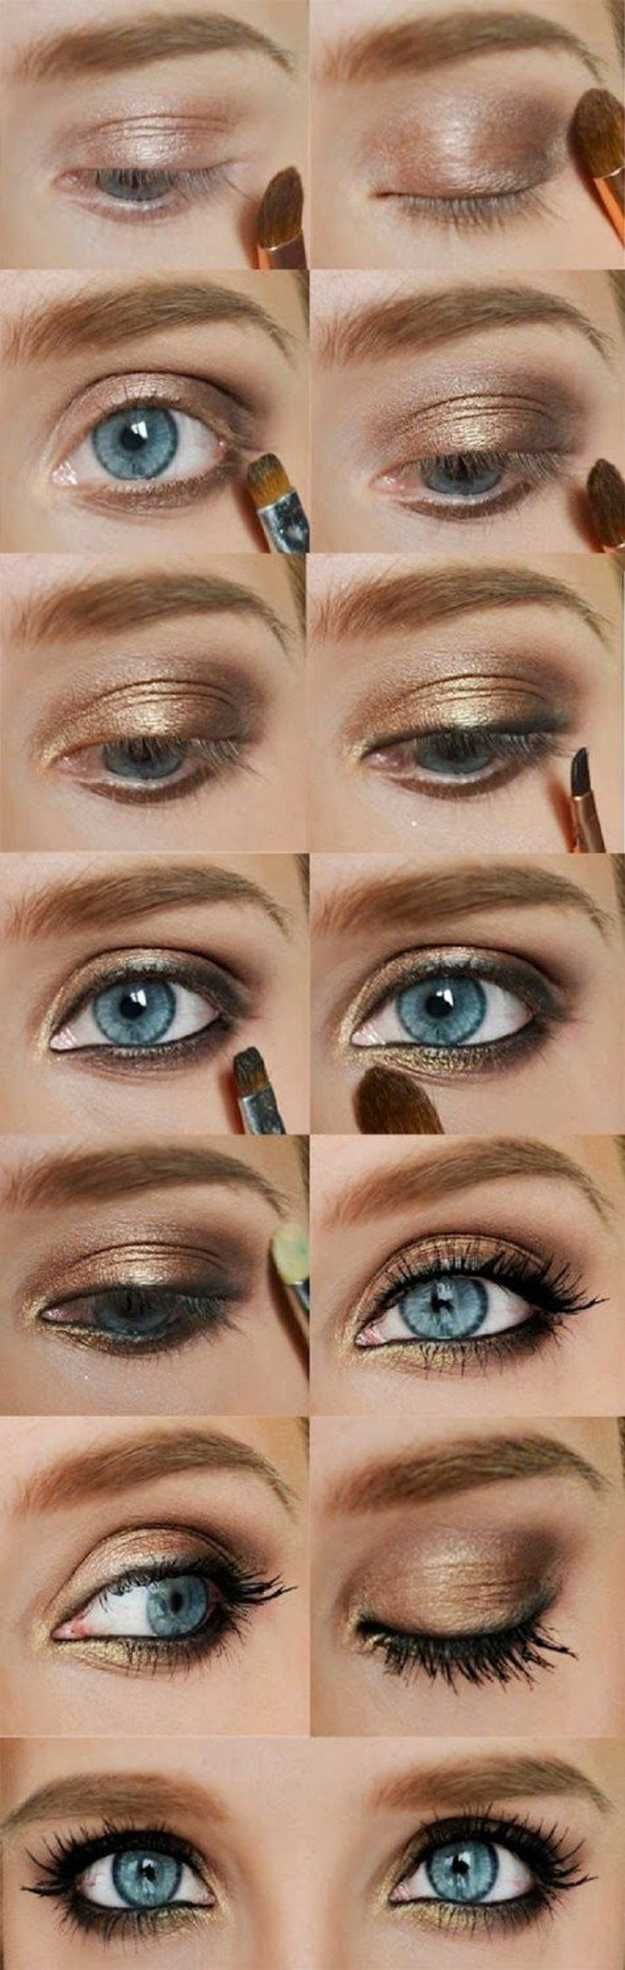 Diy makeup tutorials gold eyeshadow colorful eyeshadow gold eyeshadow colorful eyeshadow tutorials makeup tutorials baditri Choice Image